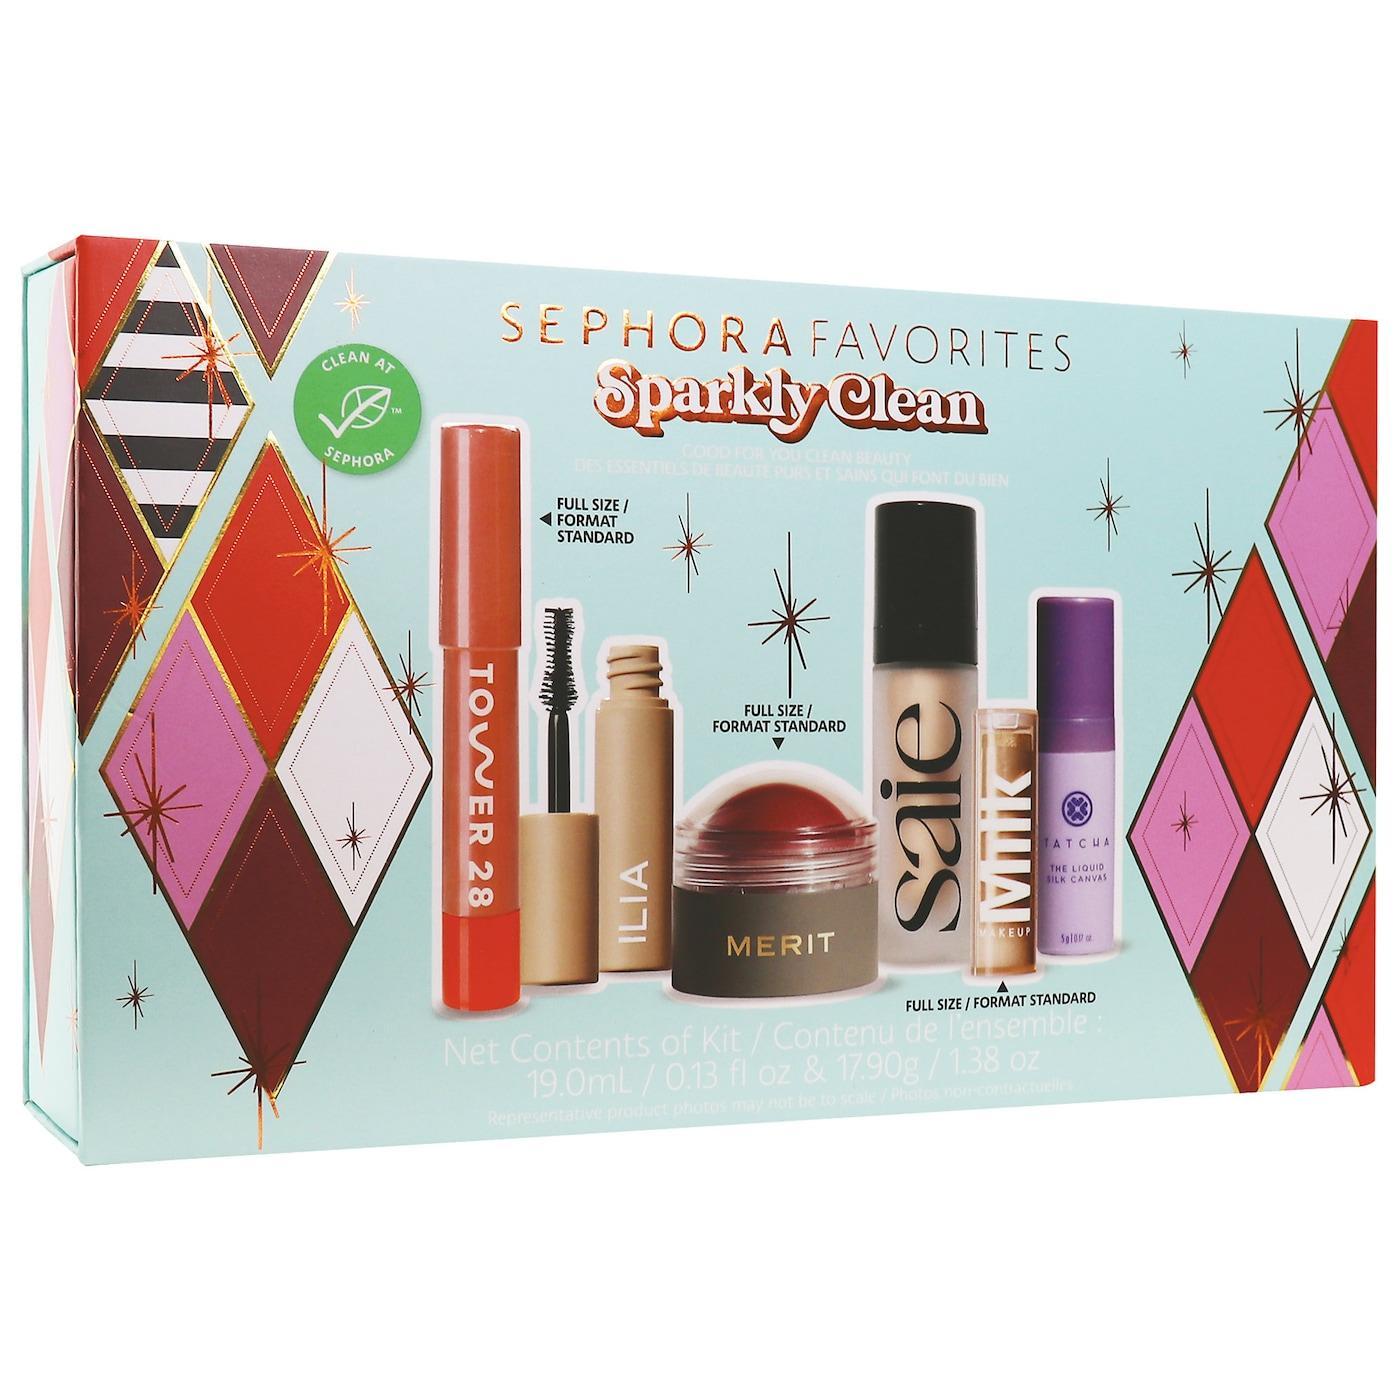 SEPHORAFavoritesSwipe of Lip Color Lipstick & Lip Balm Set – On Sale Now!